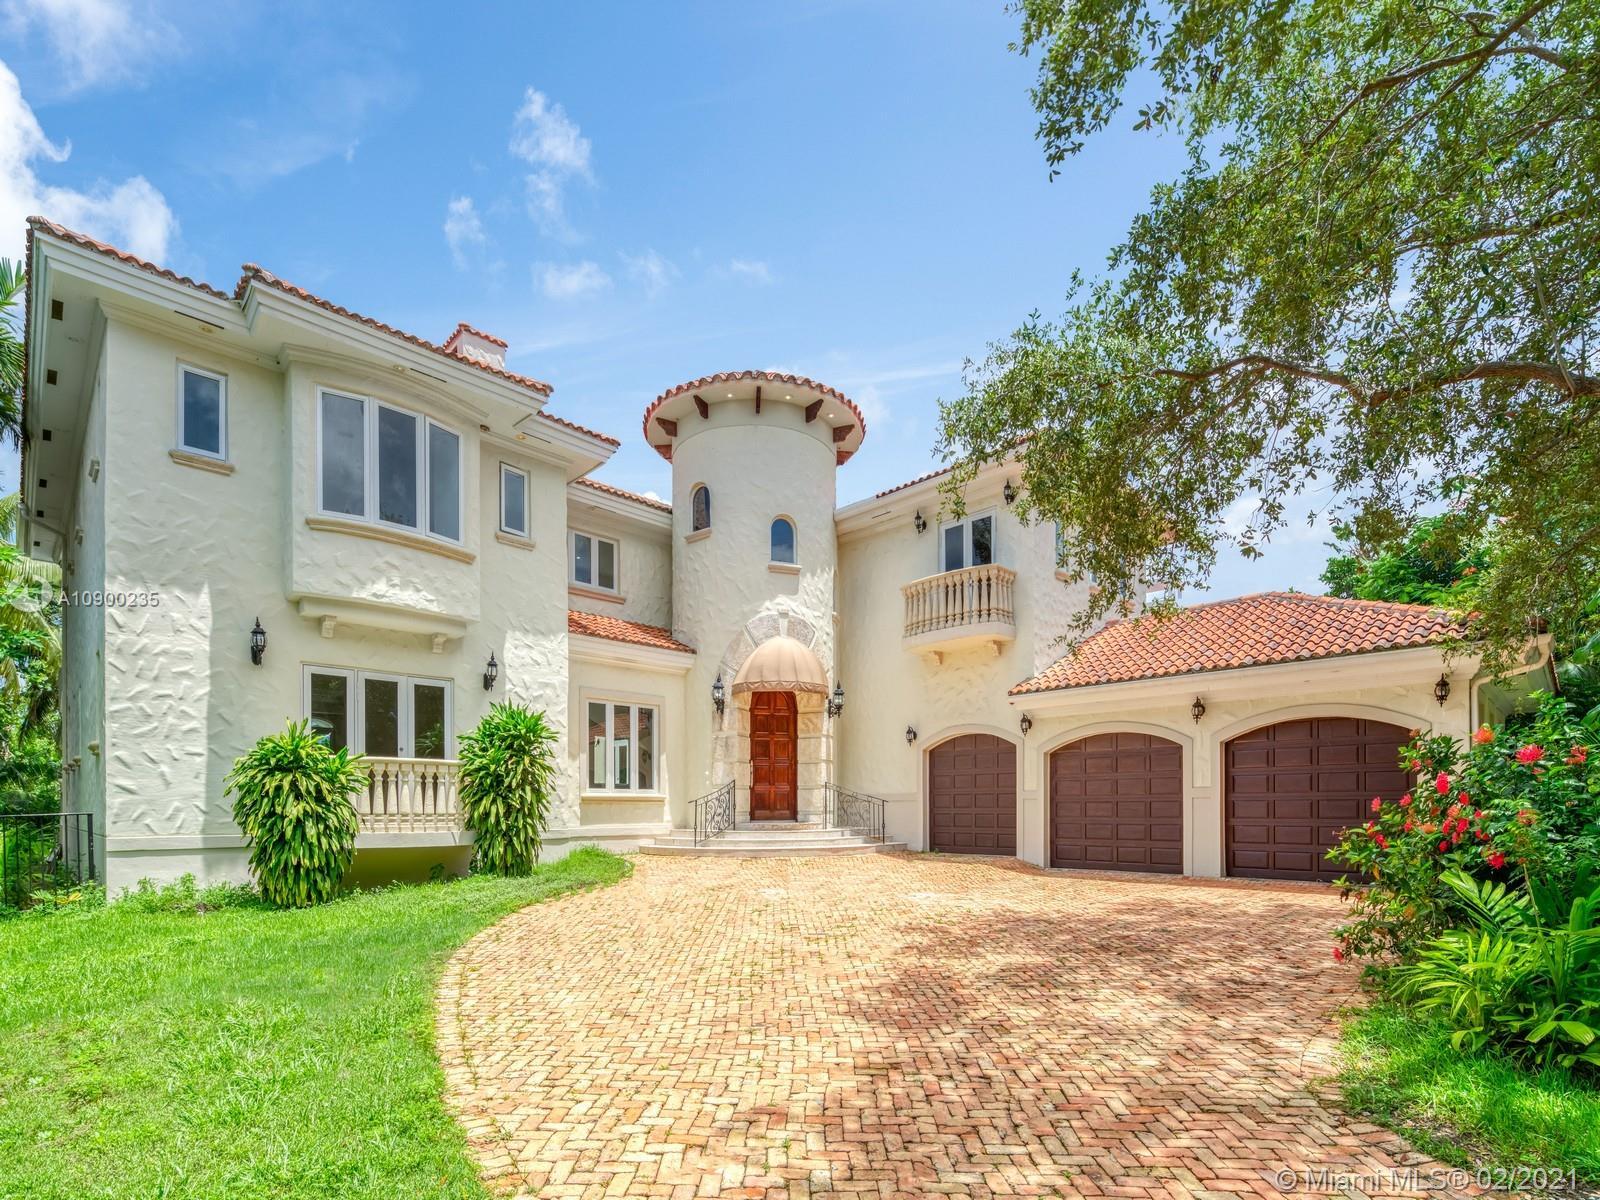 Real Estate Photo A10900235